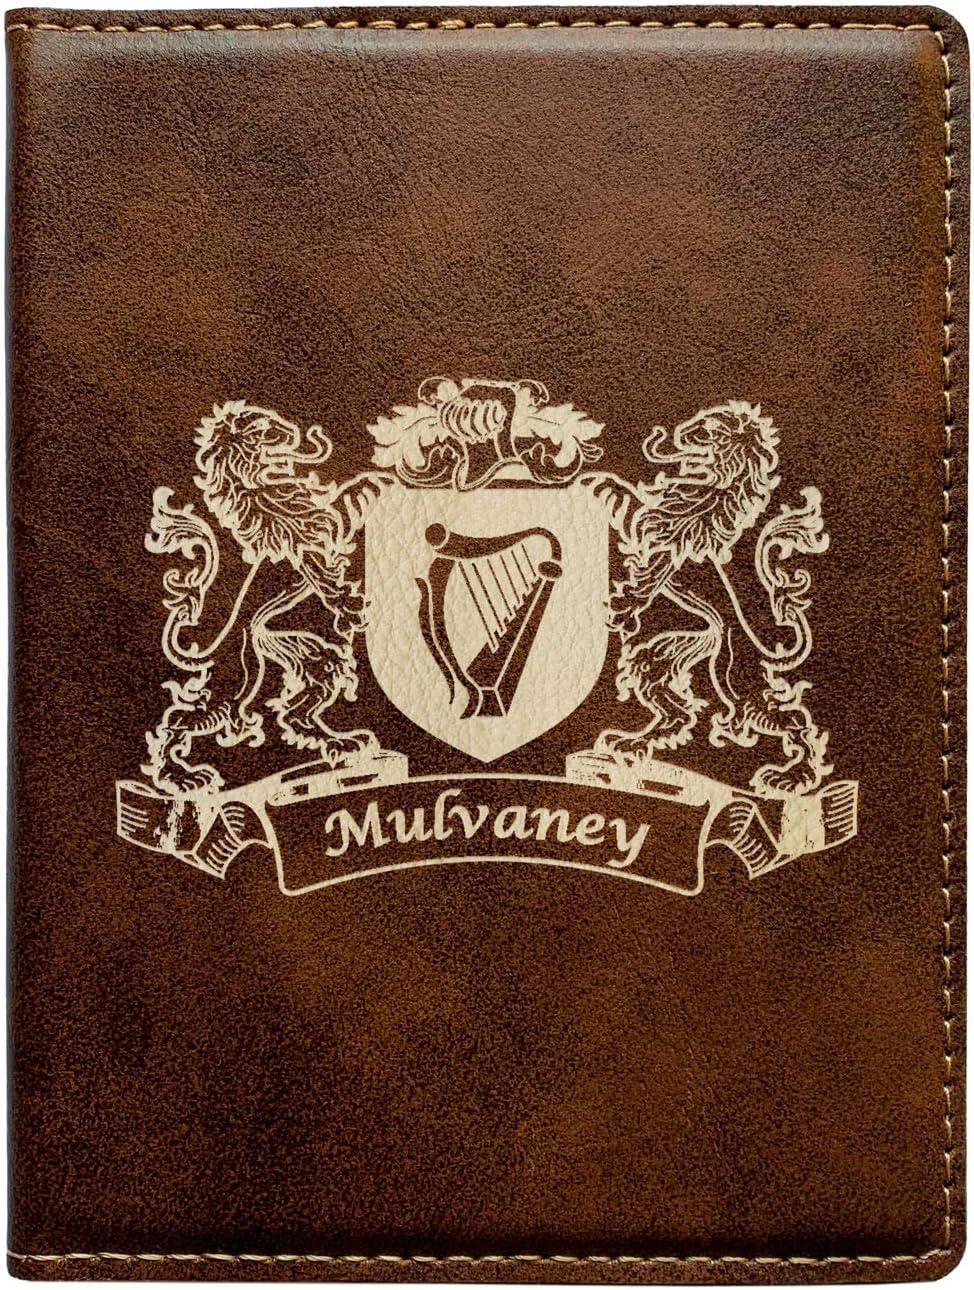 Mulvaney Irish Coat of Arms Leather Passport Wallet